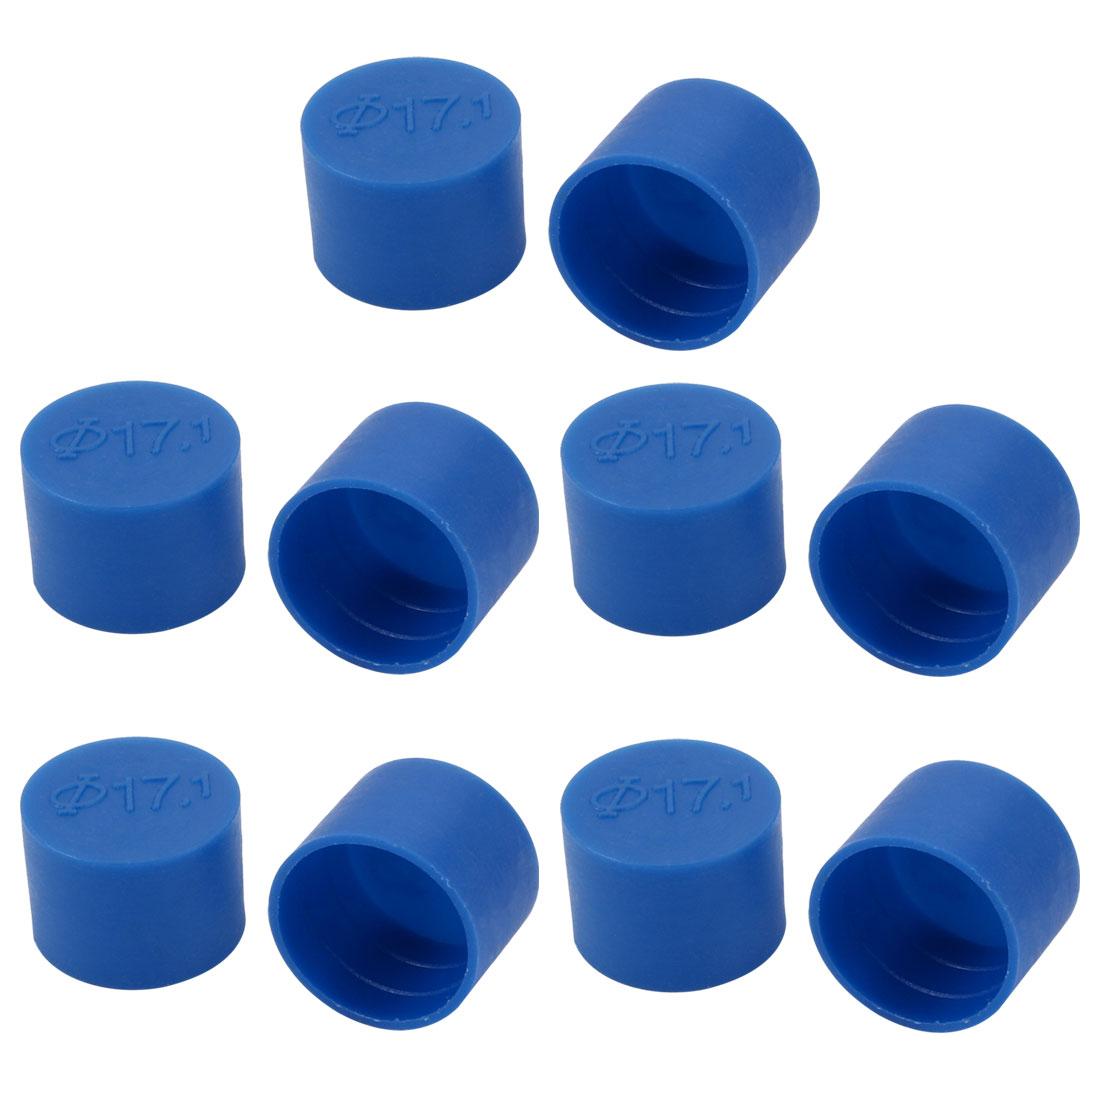 10pcs 17mm Inner Dia PE Plastic End Cap Bolt Thread Protector Tube Cover Blue